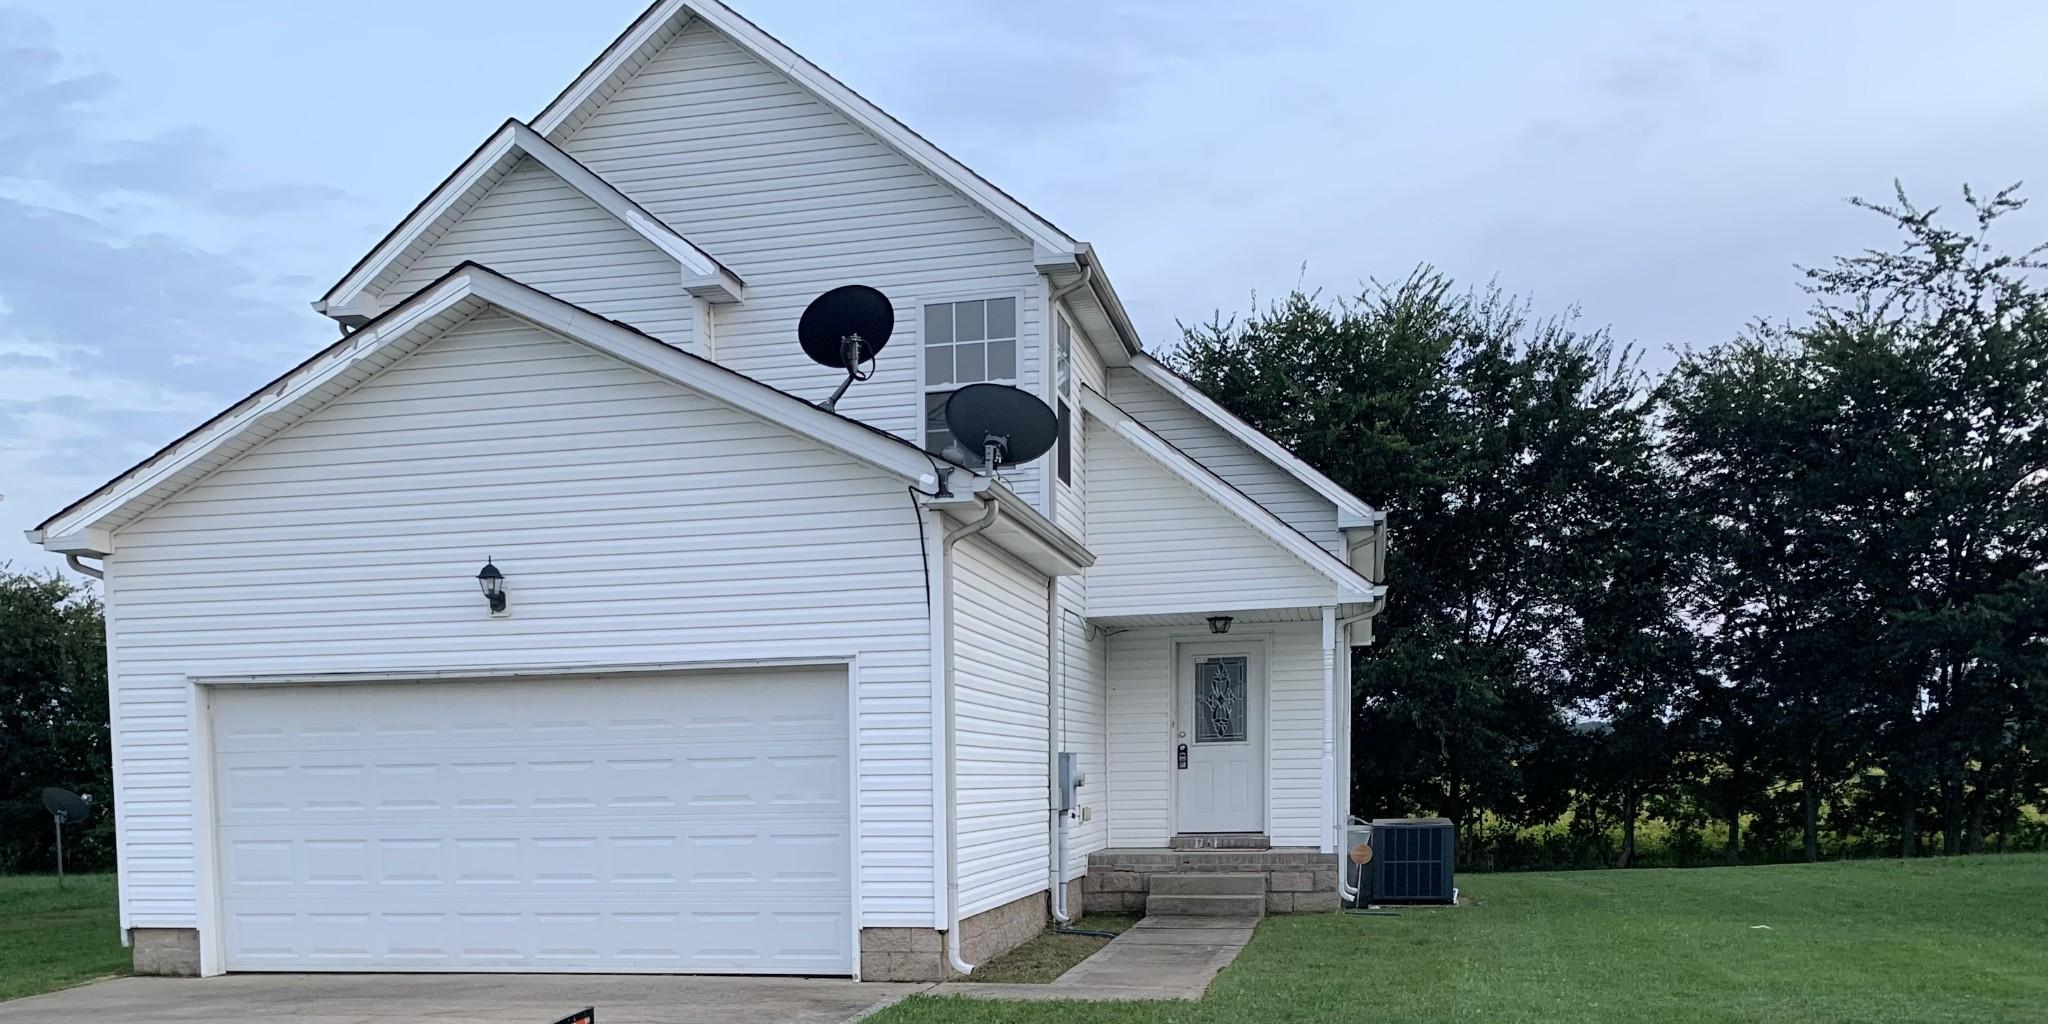 608 S Cavalcade Cir, Oak Grove, KY 42262